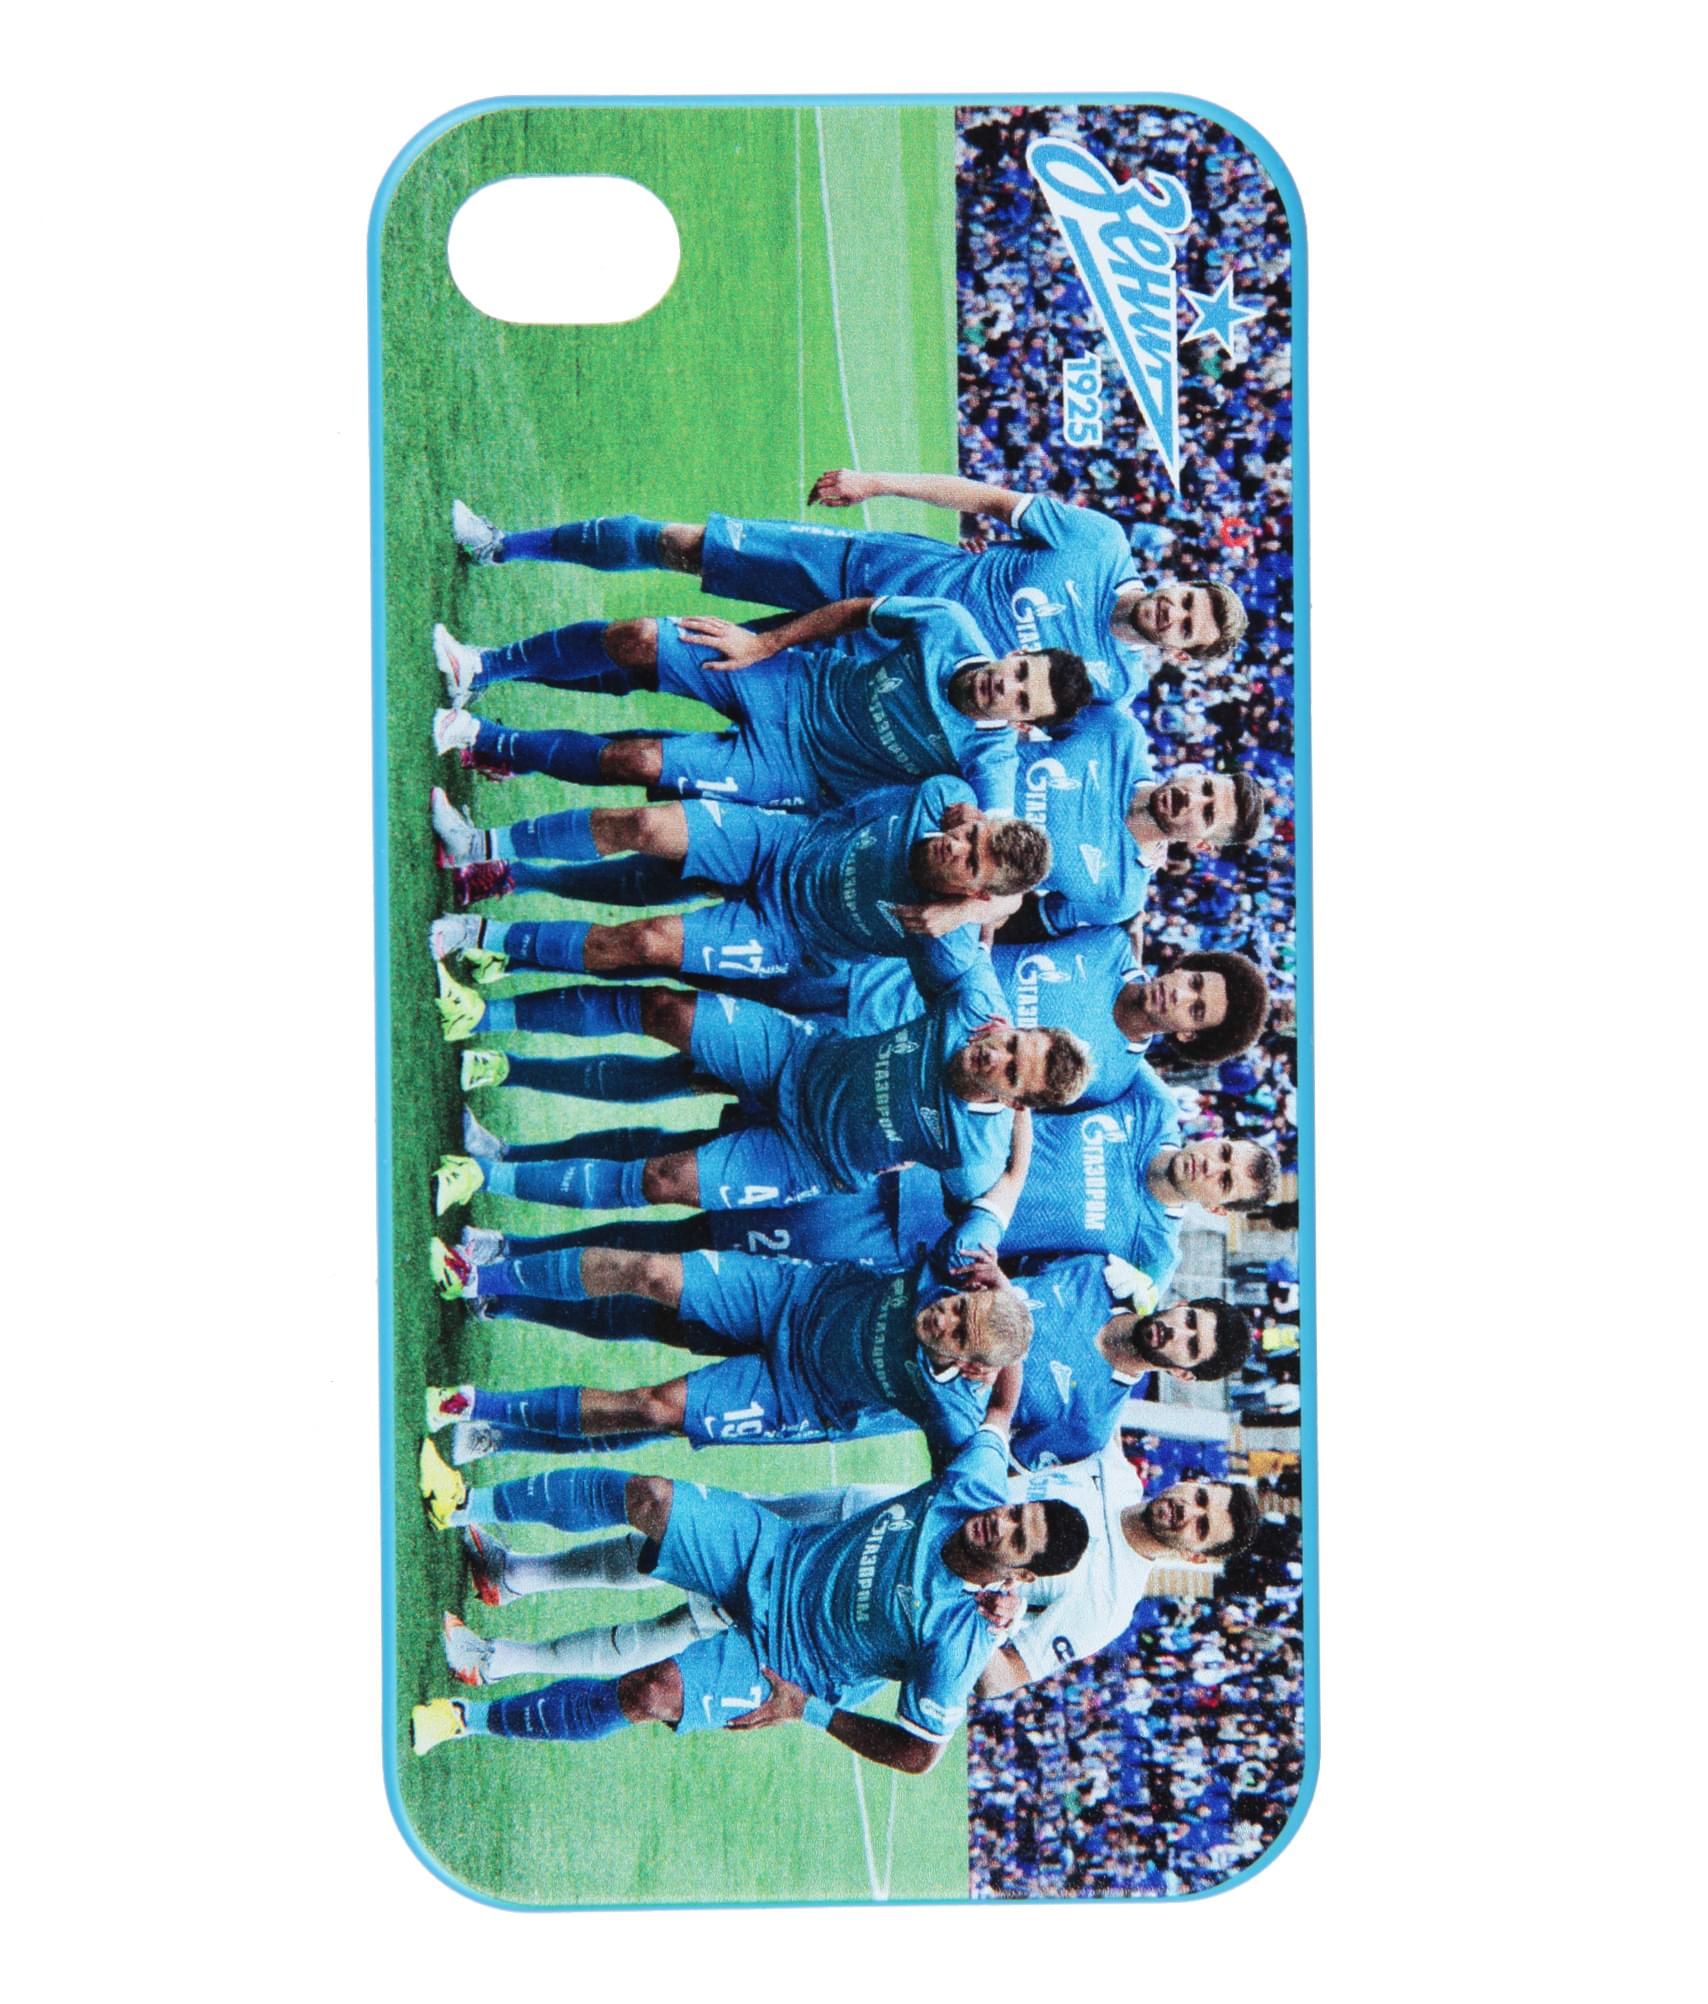 Чехол для IPhone 4  «Команда» Зенит